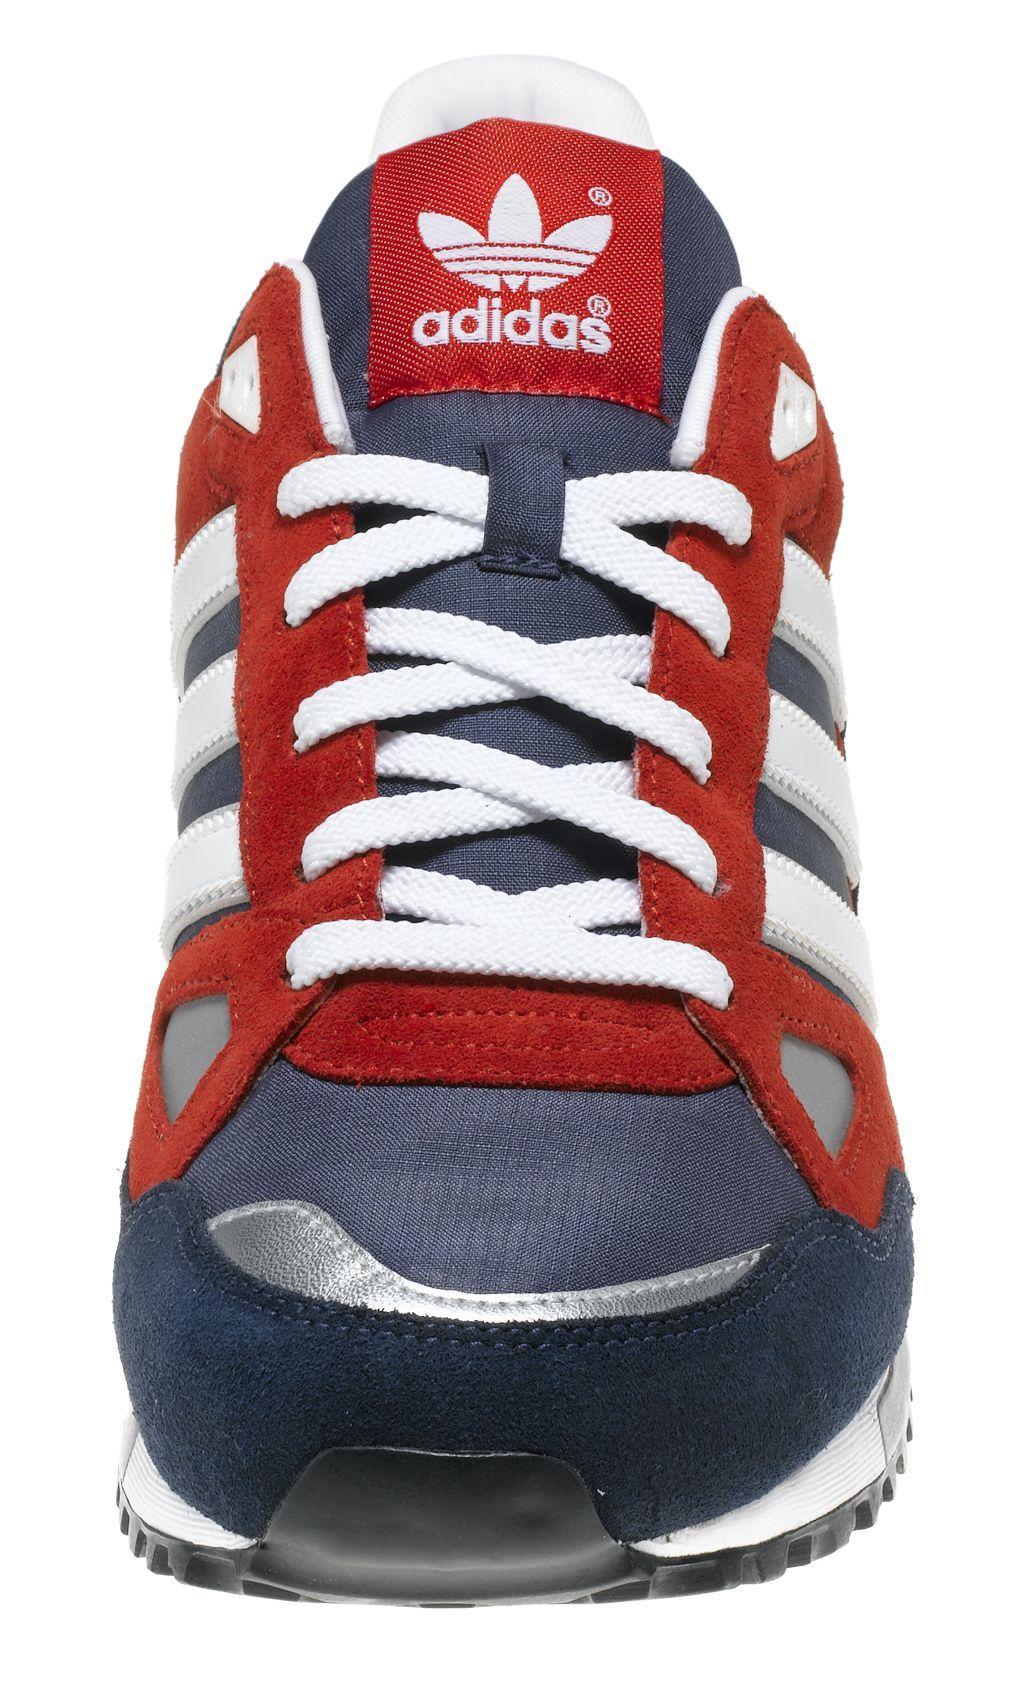 adidas sneakers homme uomo